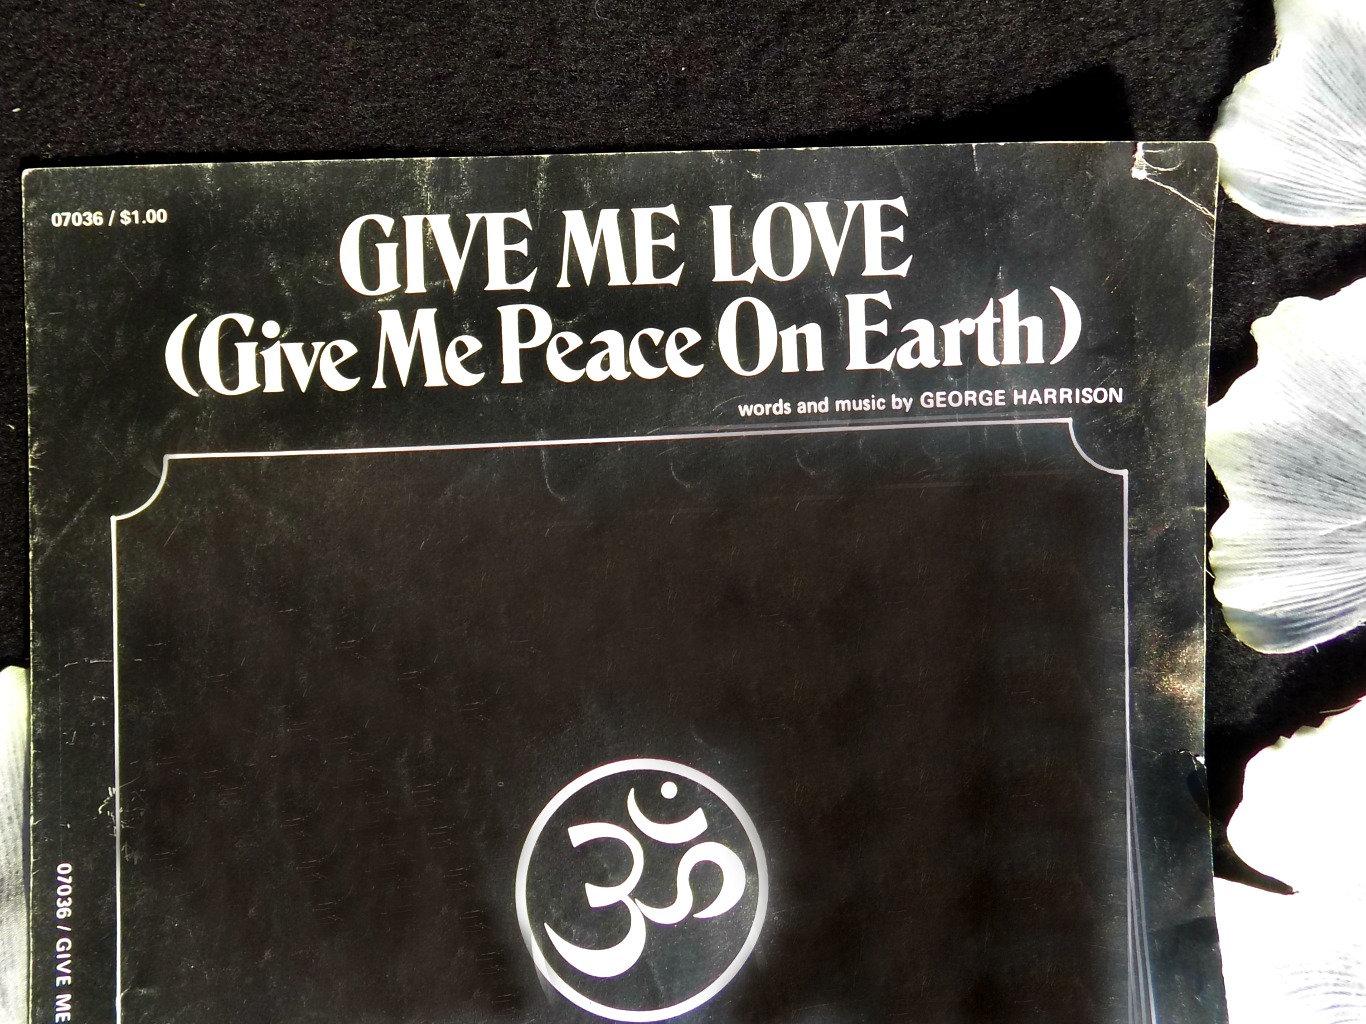 vocal and instrumental sheet music -Vintage piano Sheet Music-Give Me Love  Music -Copyright 1973 - paper ephemera